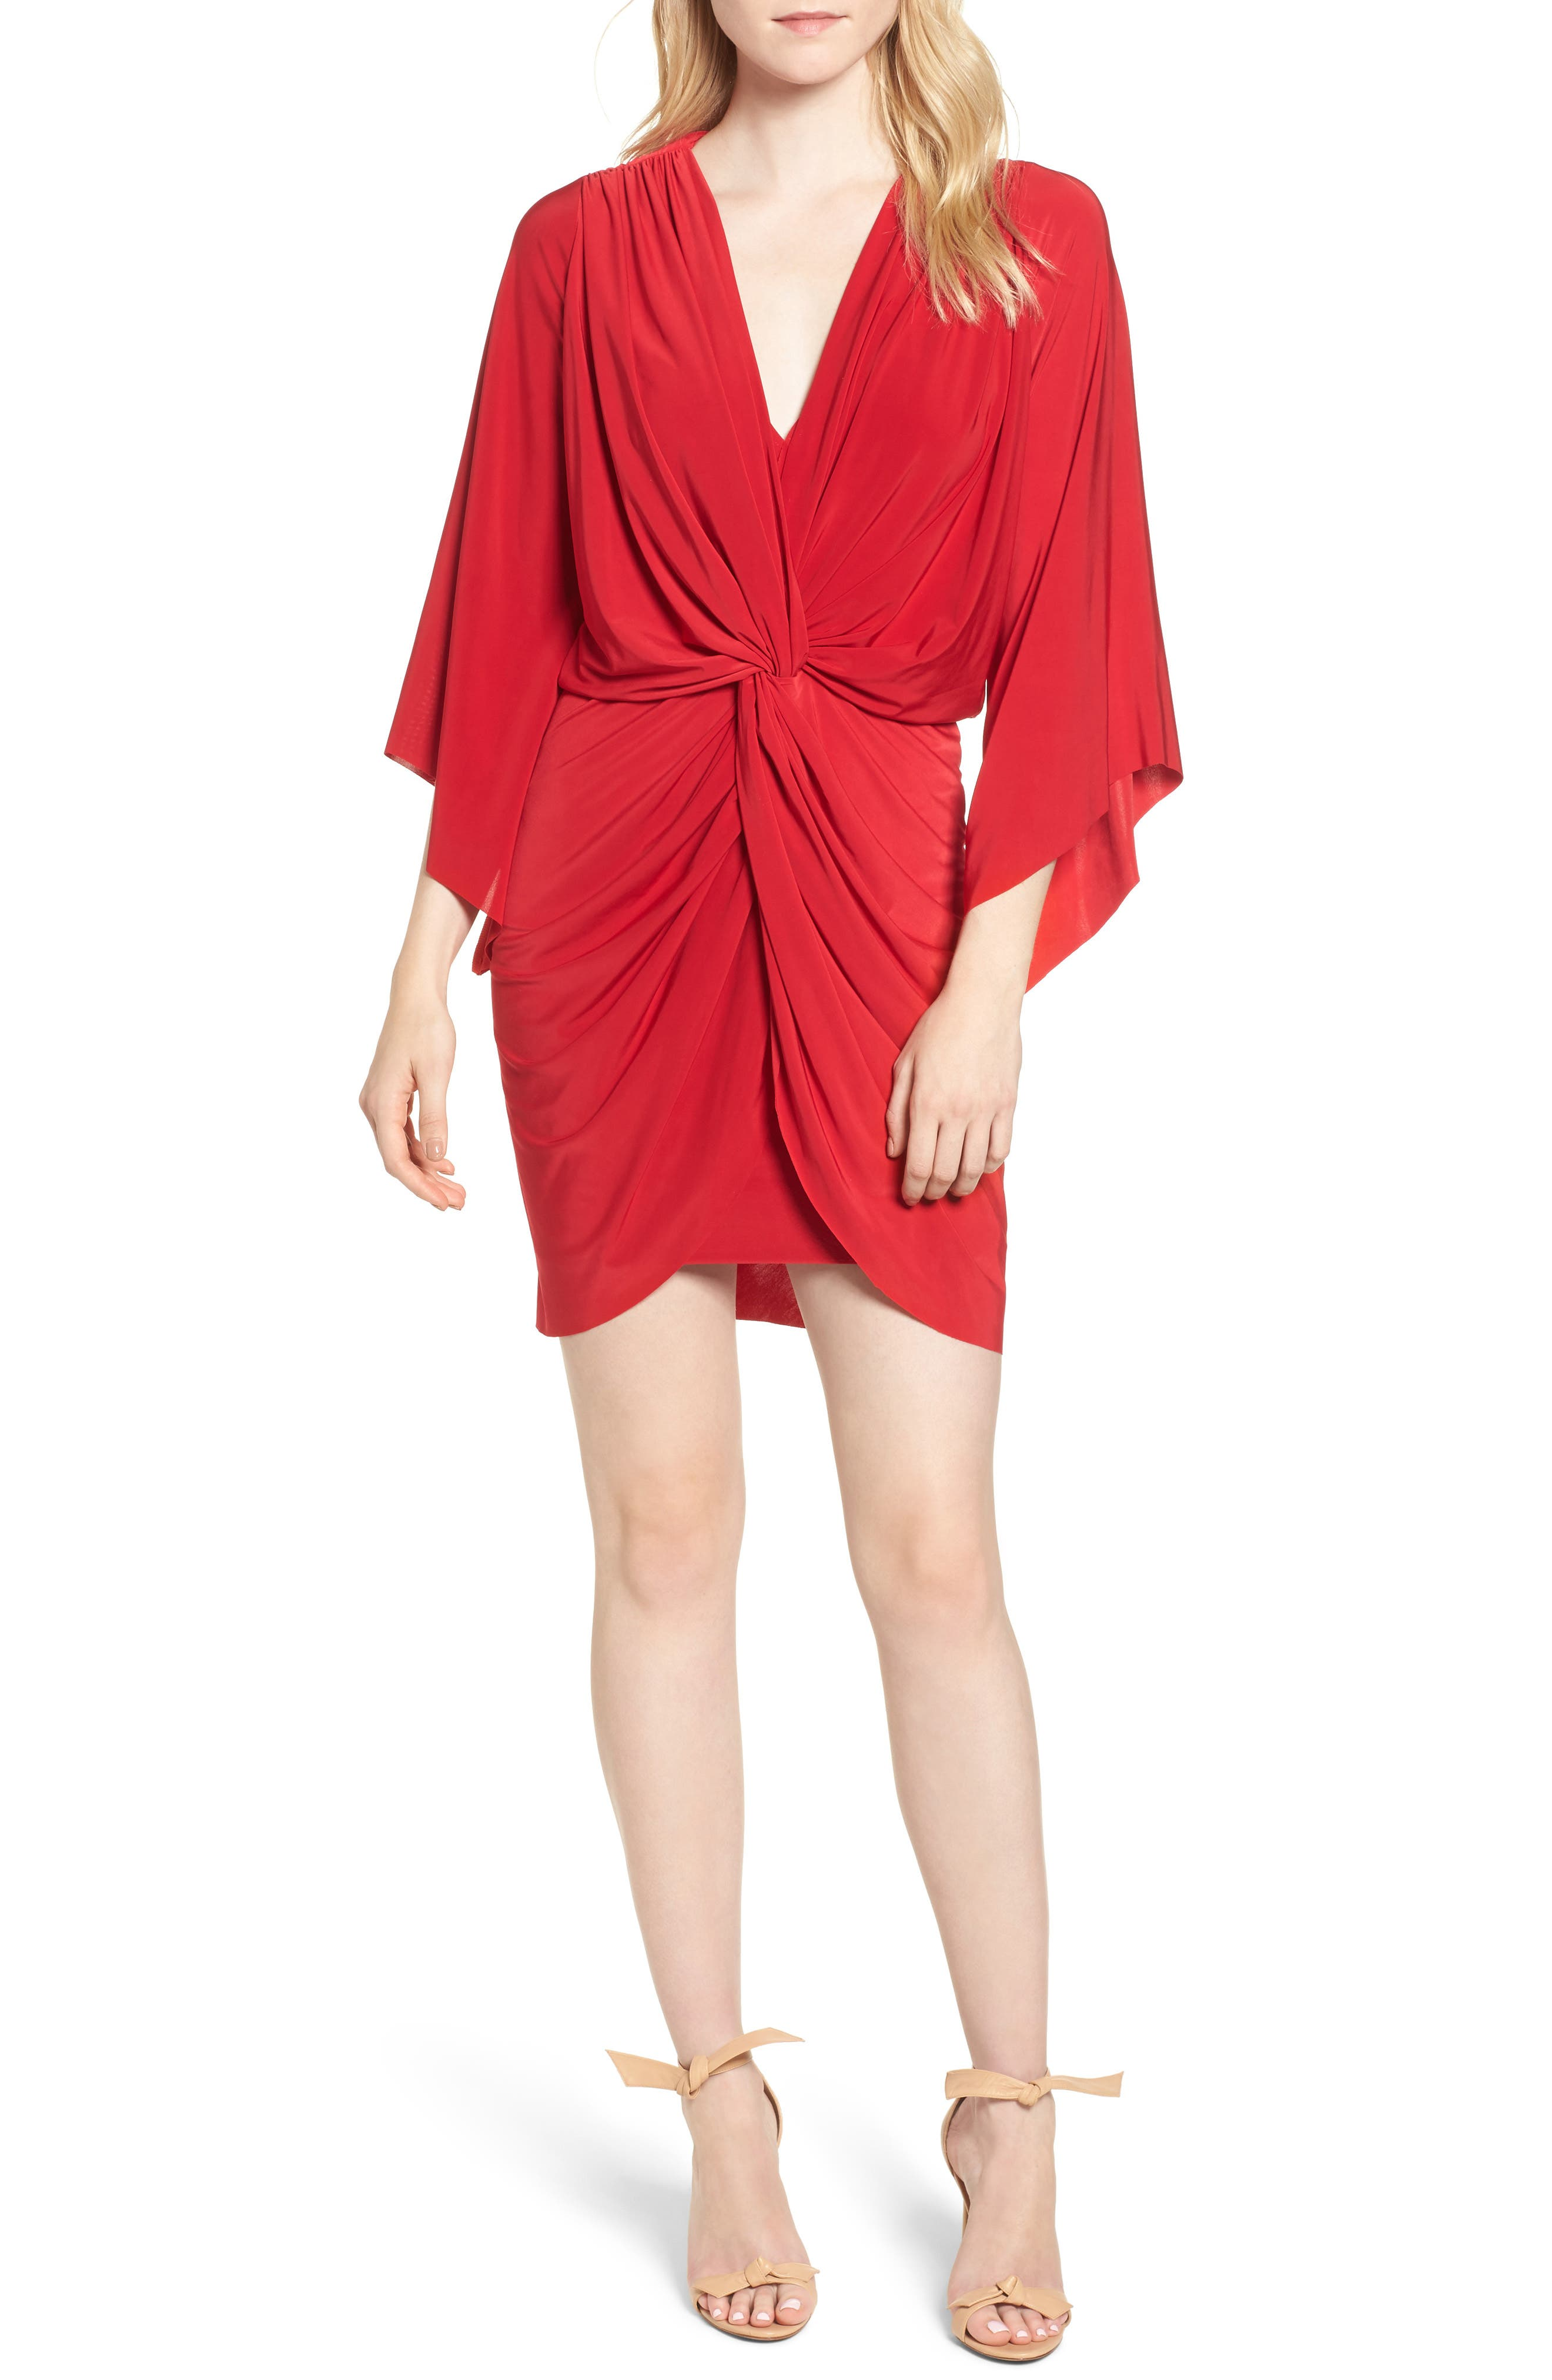 Alternate Image 1 Selected - MISA Los Angeles Teget Knot Front Dress